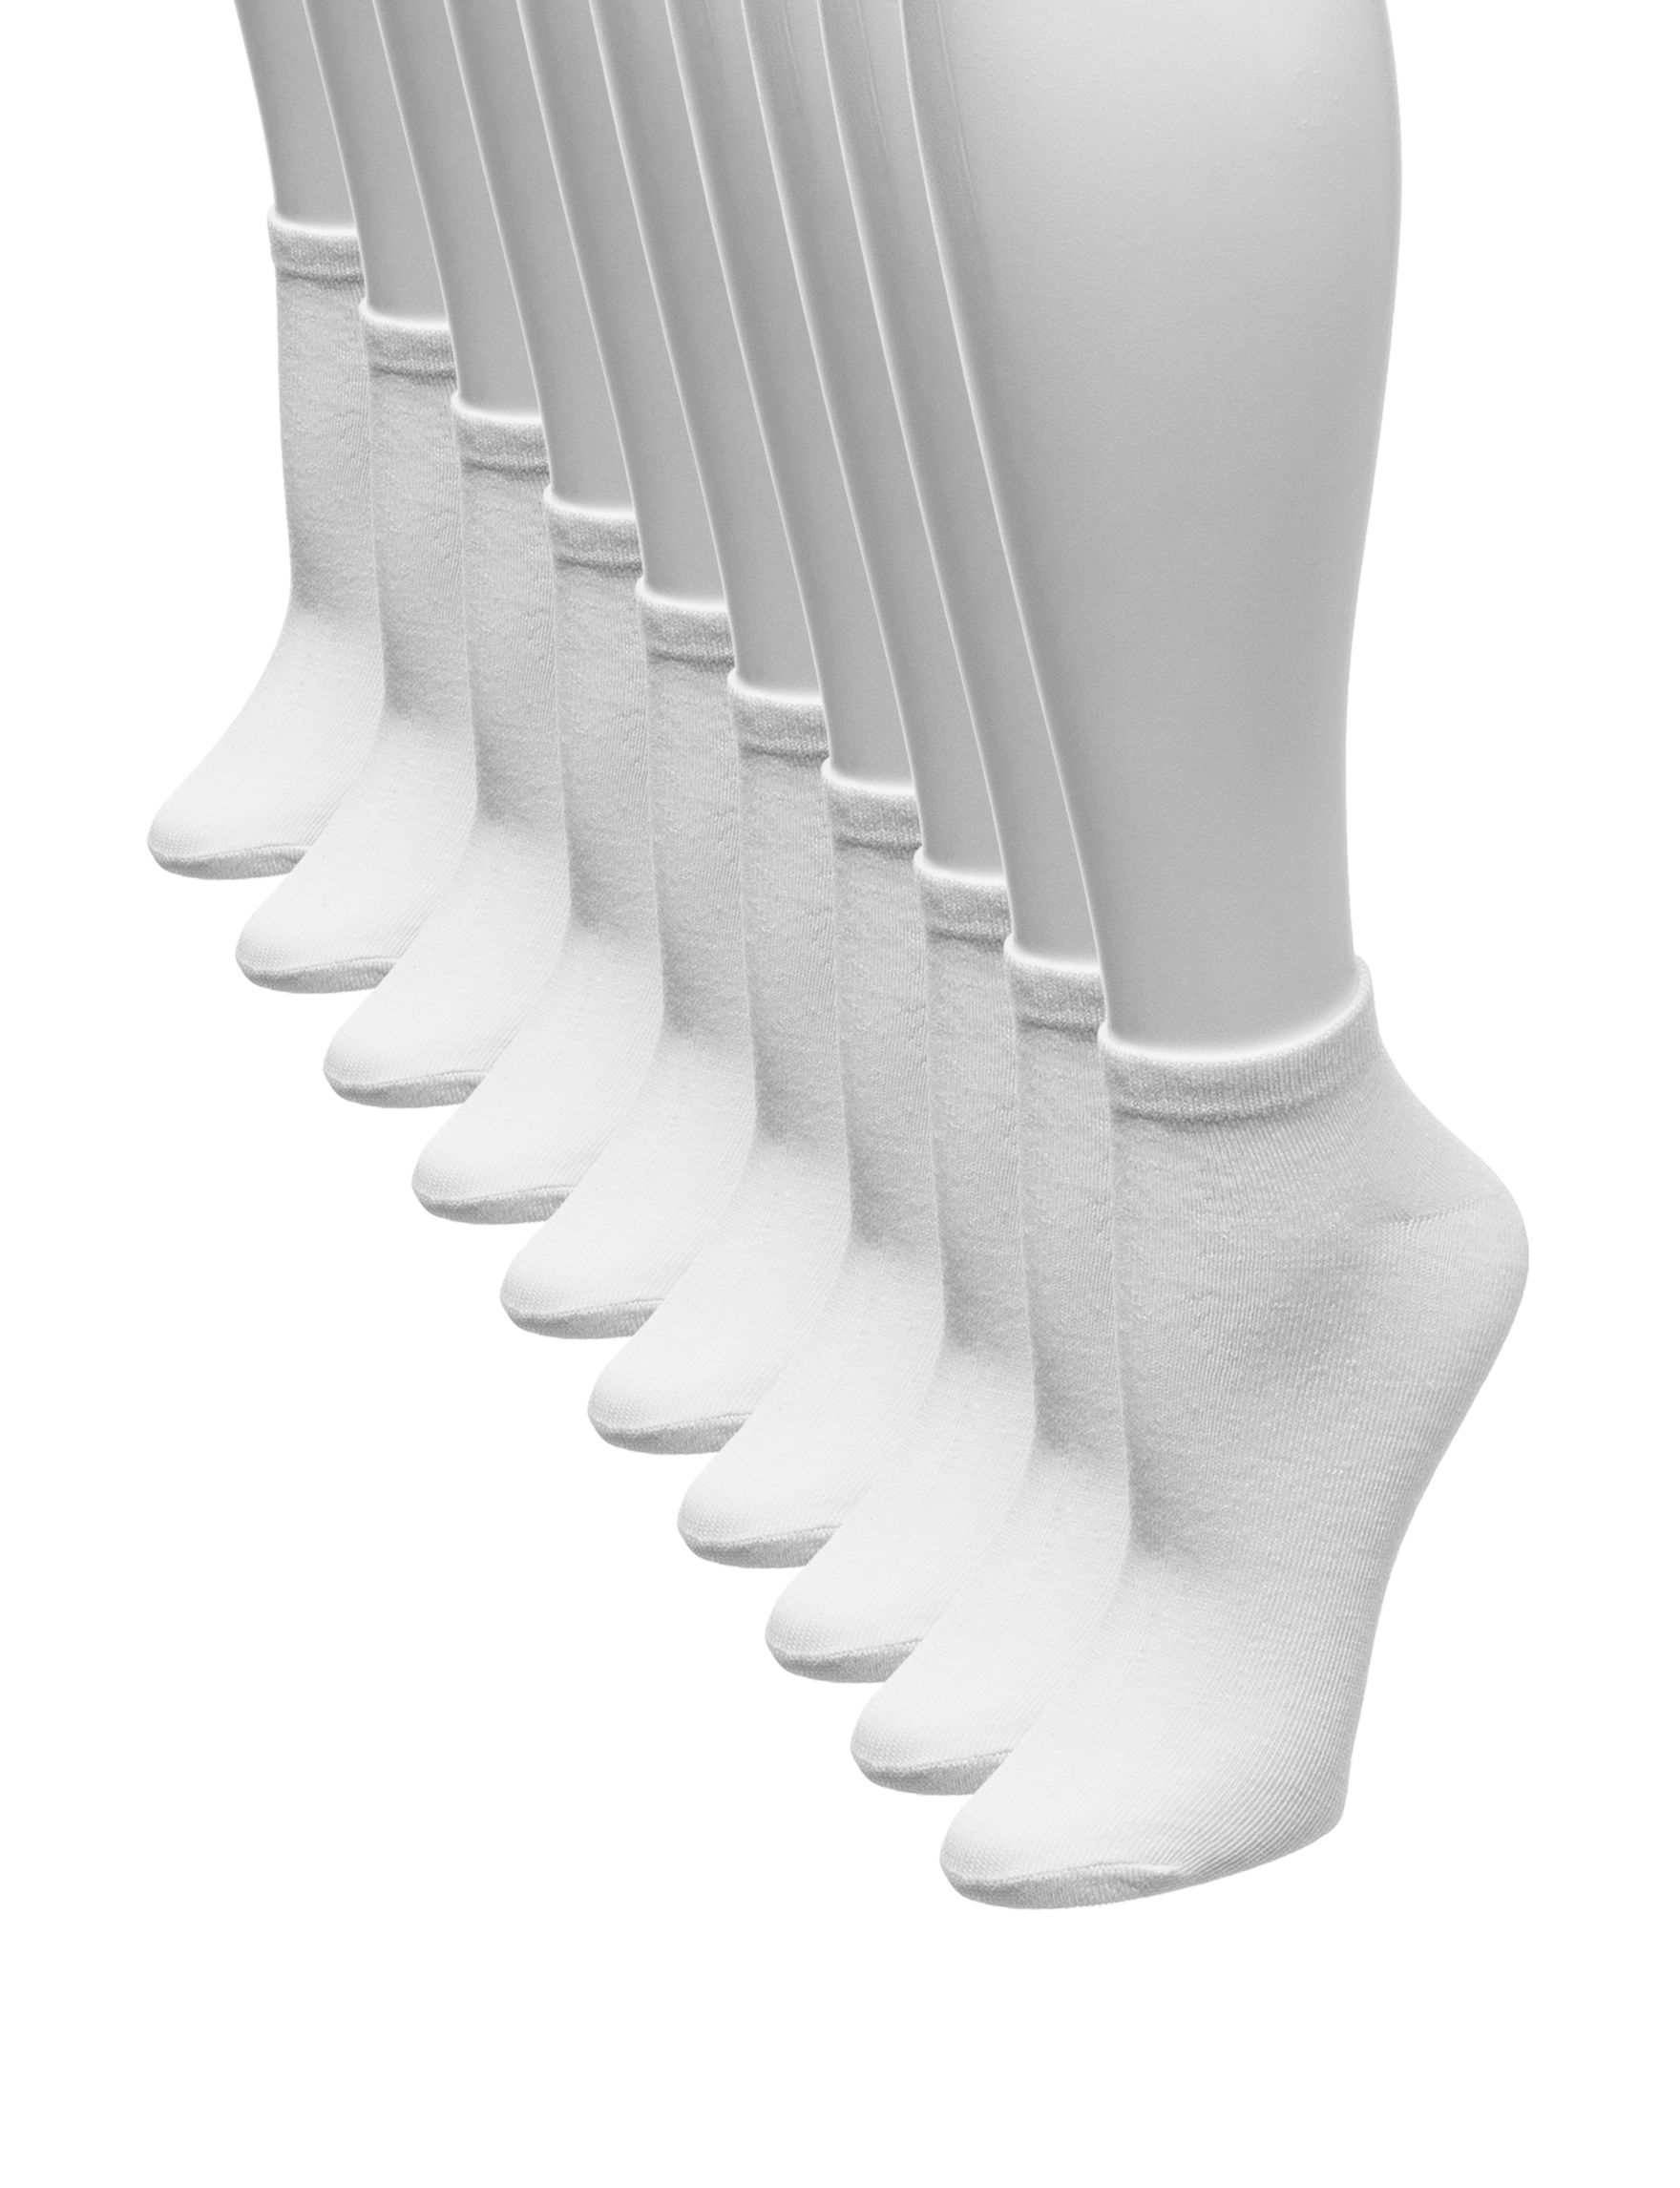 Modern Herritage White Socks